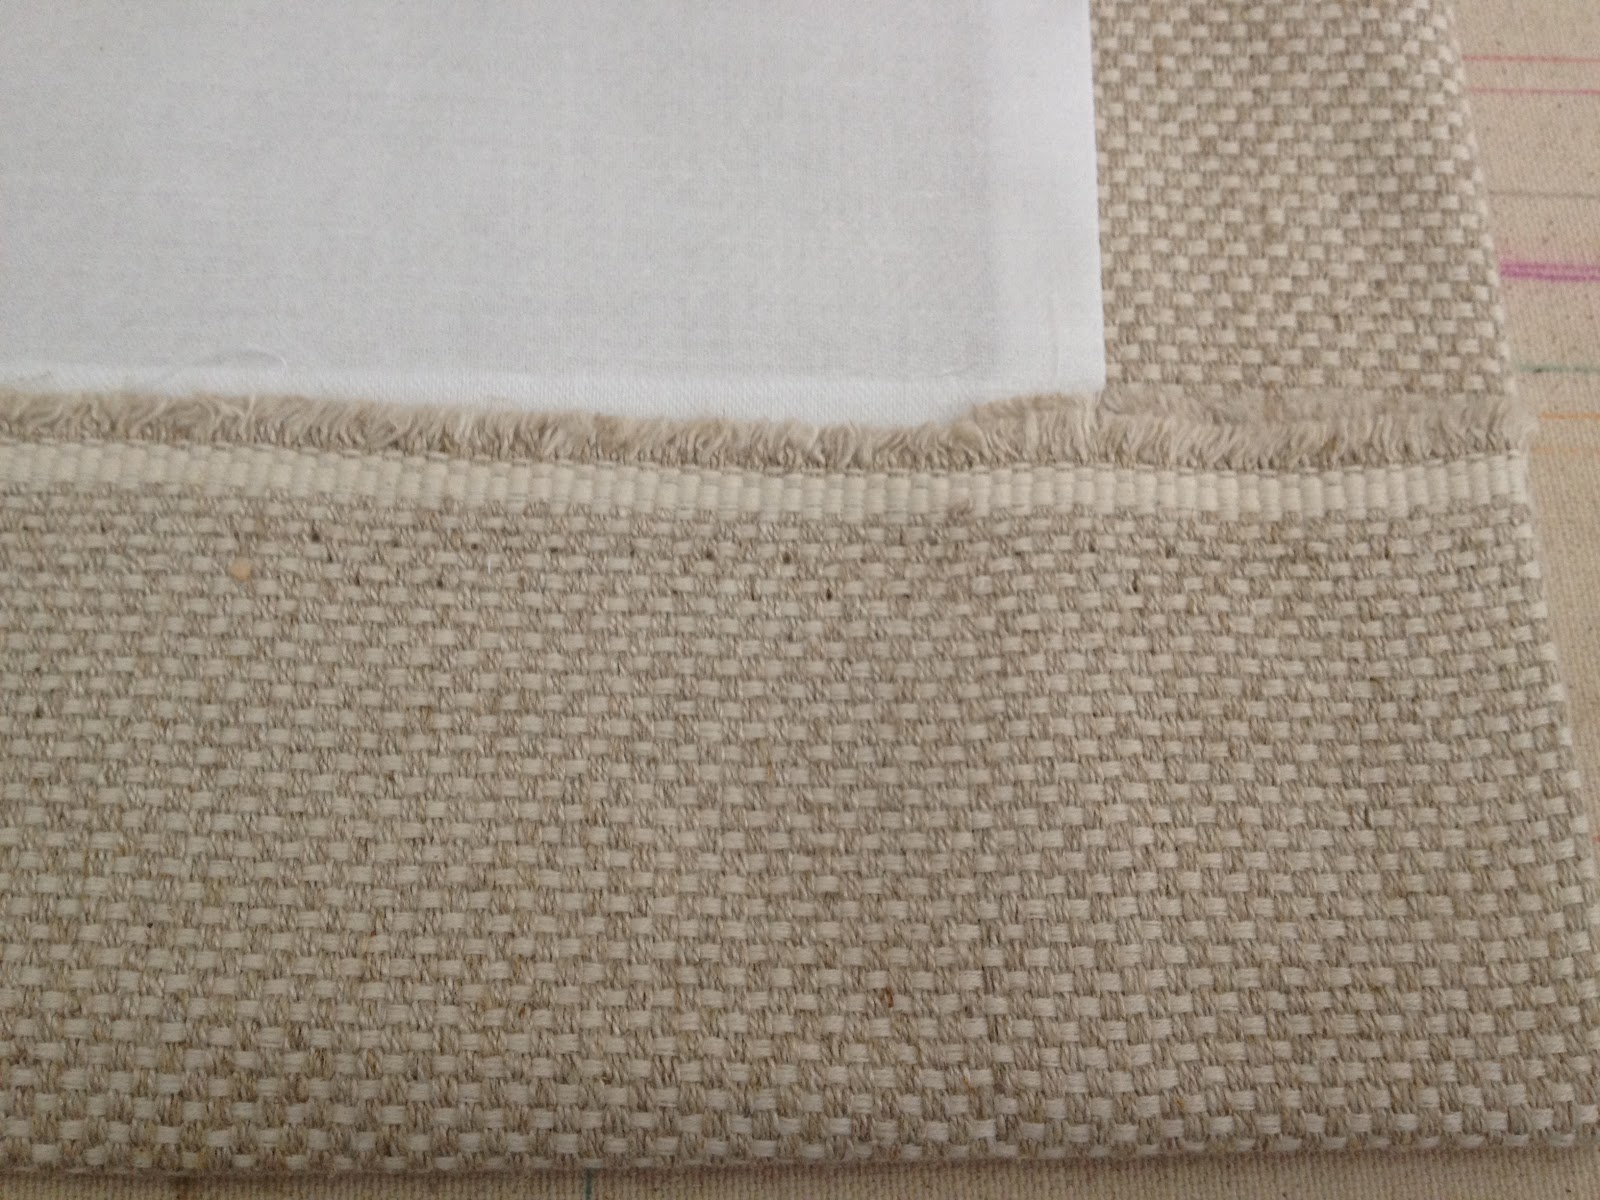 Making Box Pleat Bed Skirt